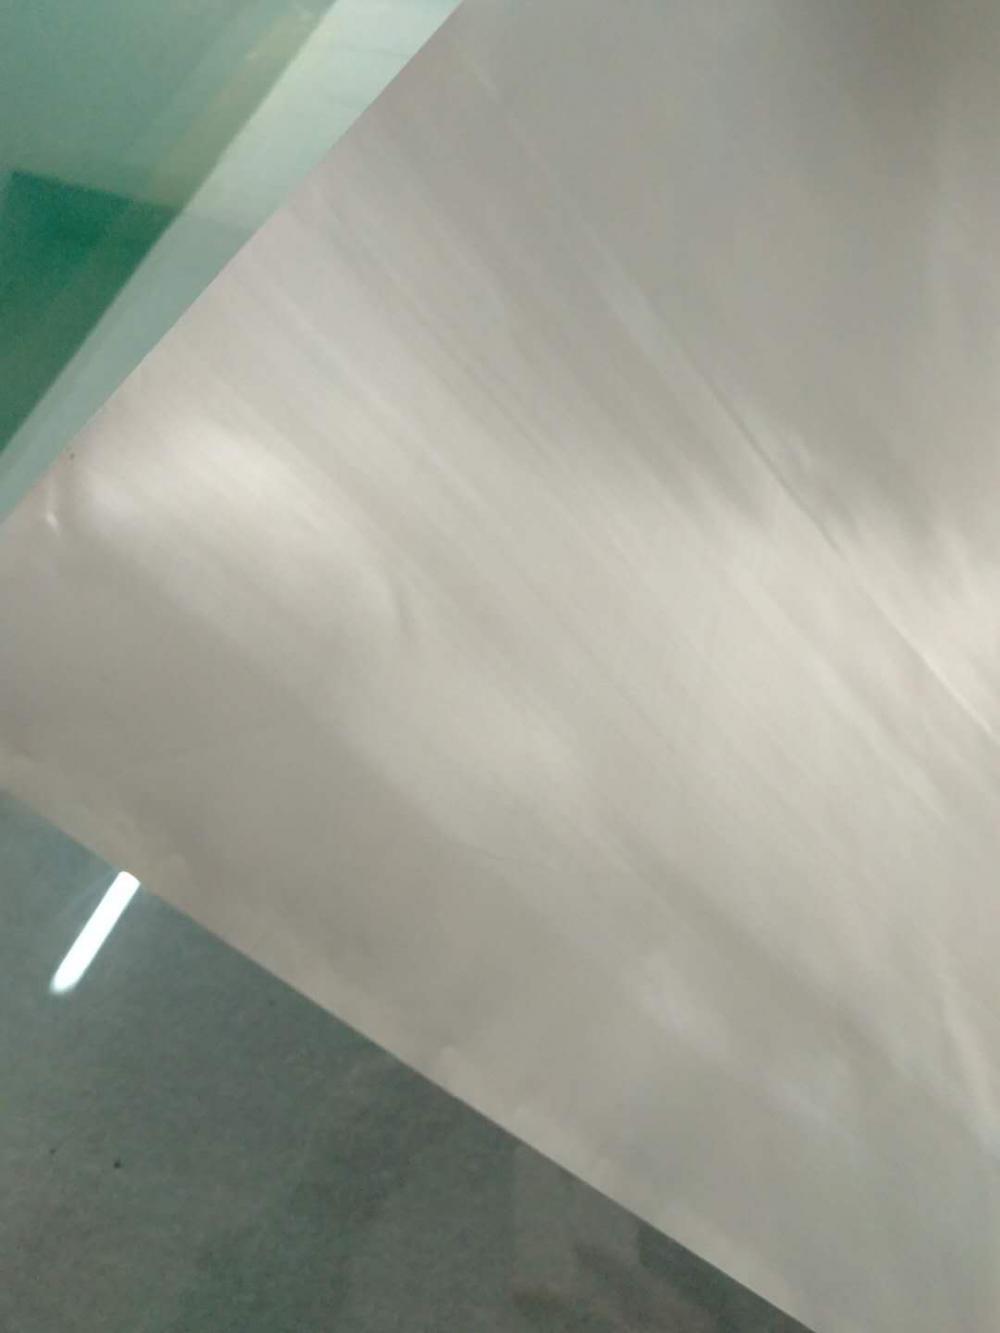 50 micron Titanium mesh sheet